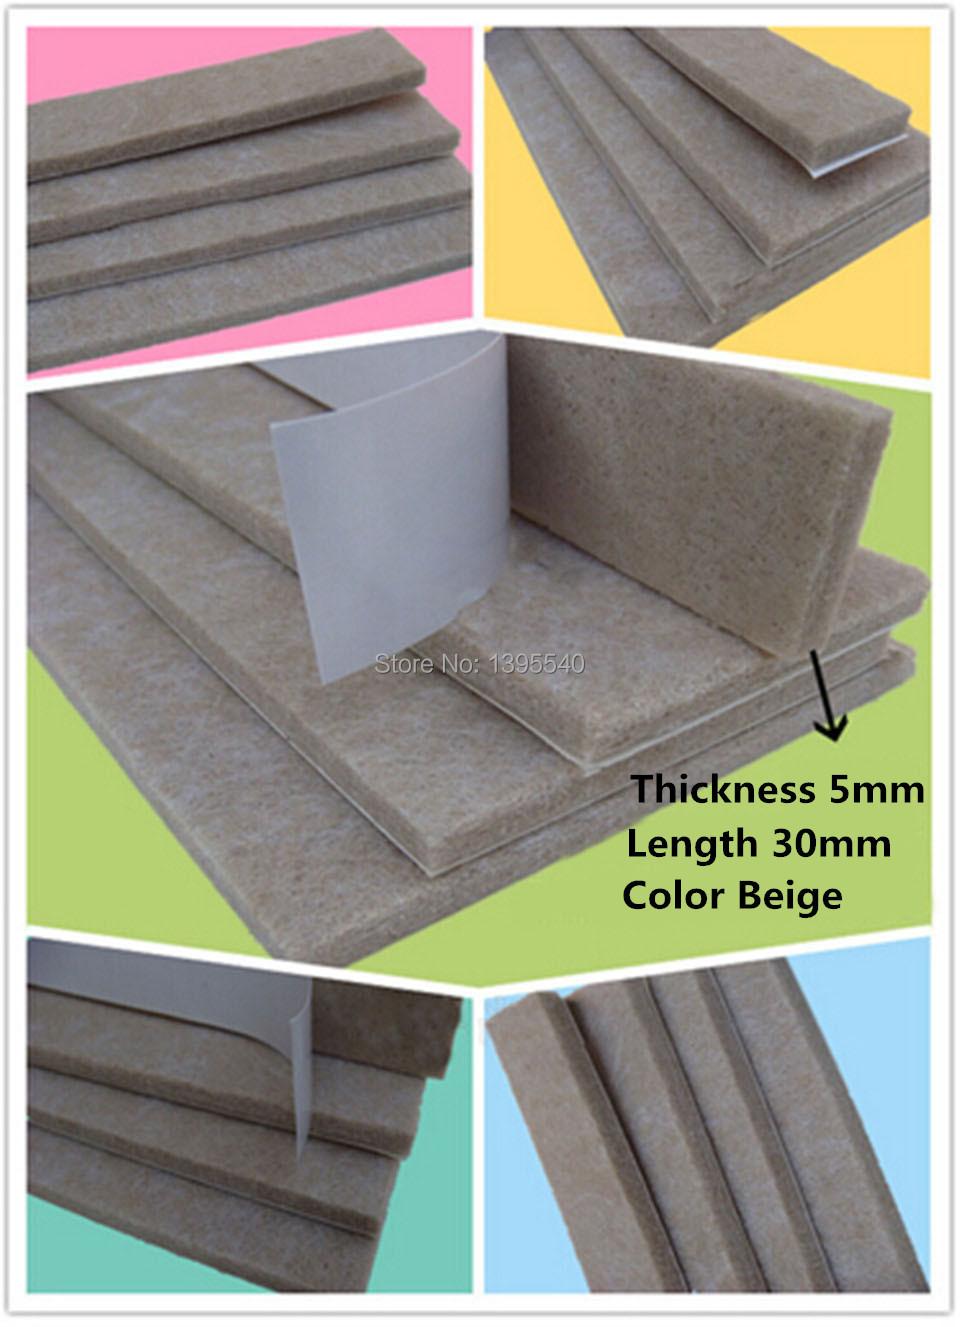 New 1pc 30X10mm Table Leg Pads Adhesive Furniture Leg Feet Non Slip Rug Felt Pads Protetcors Anti Slip Beige Mat Fittings<br><br>Aliexpress